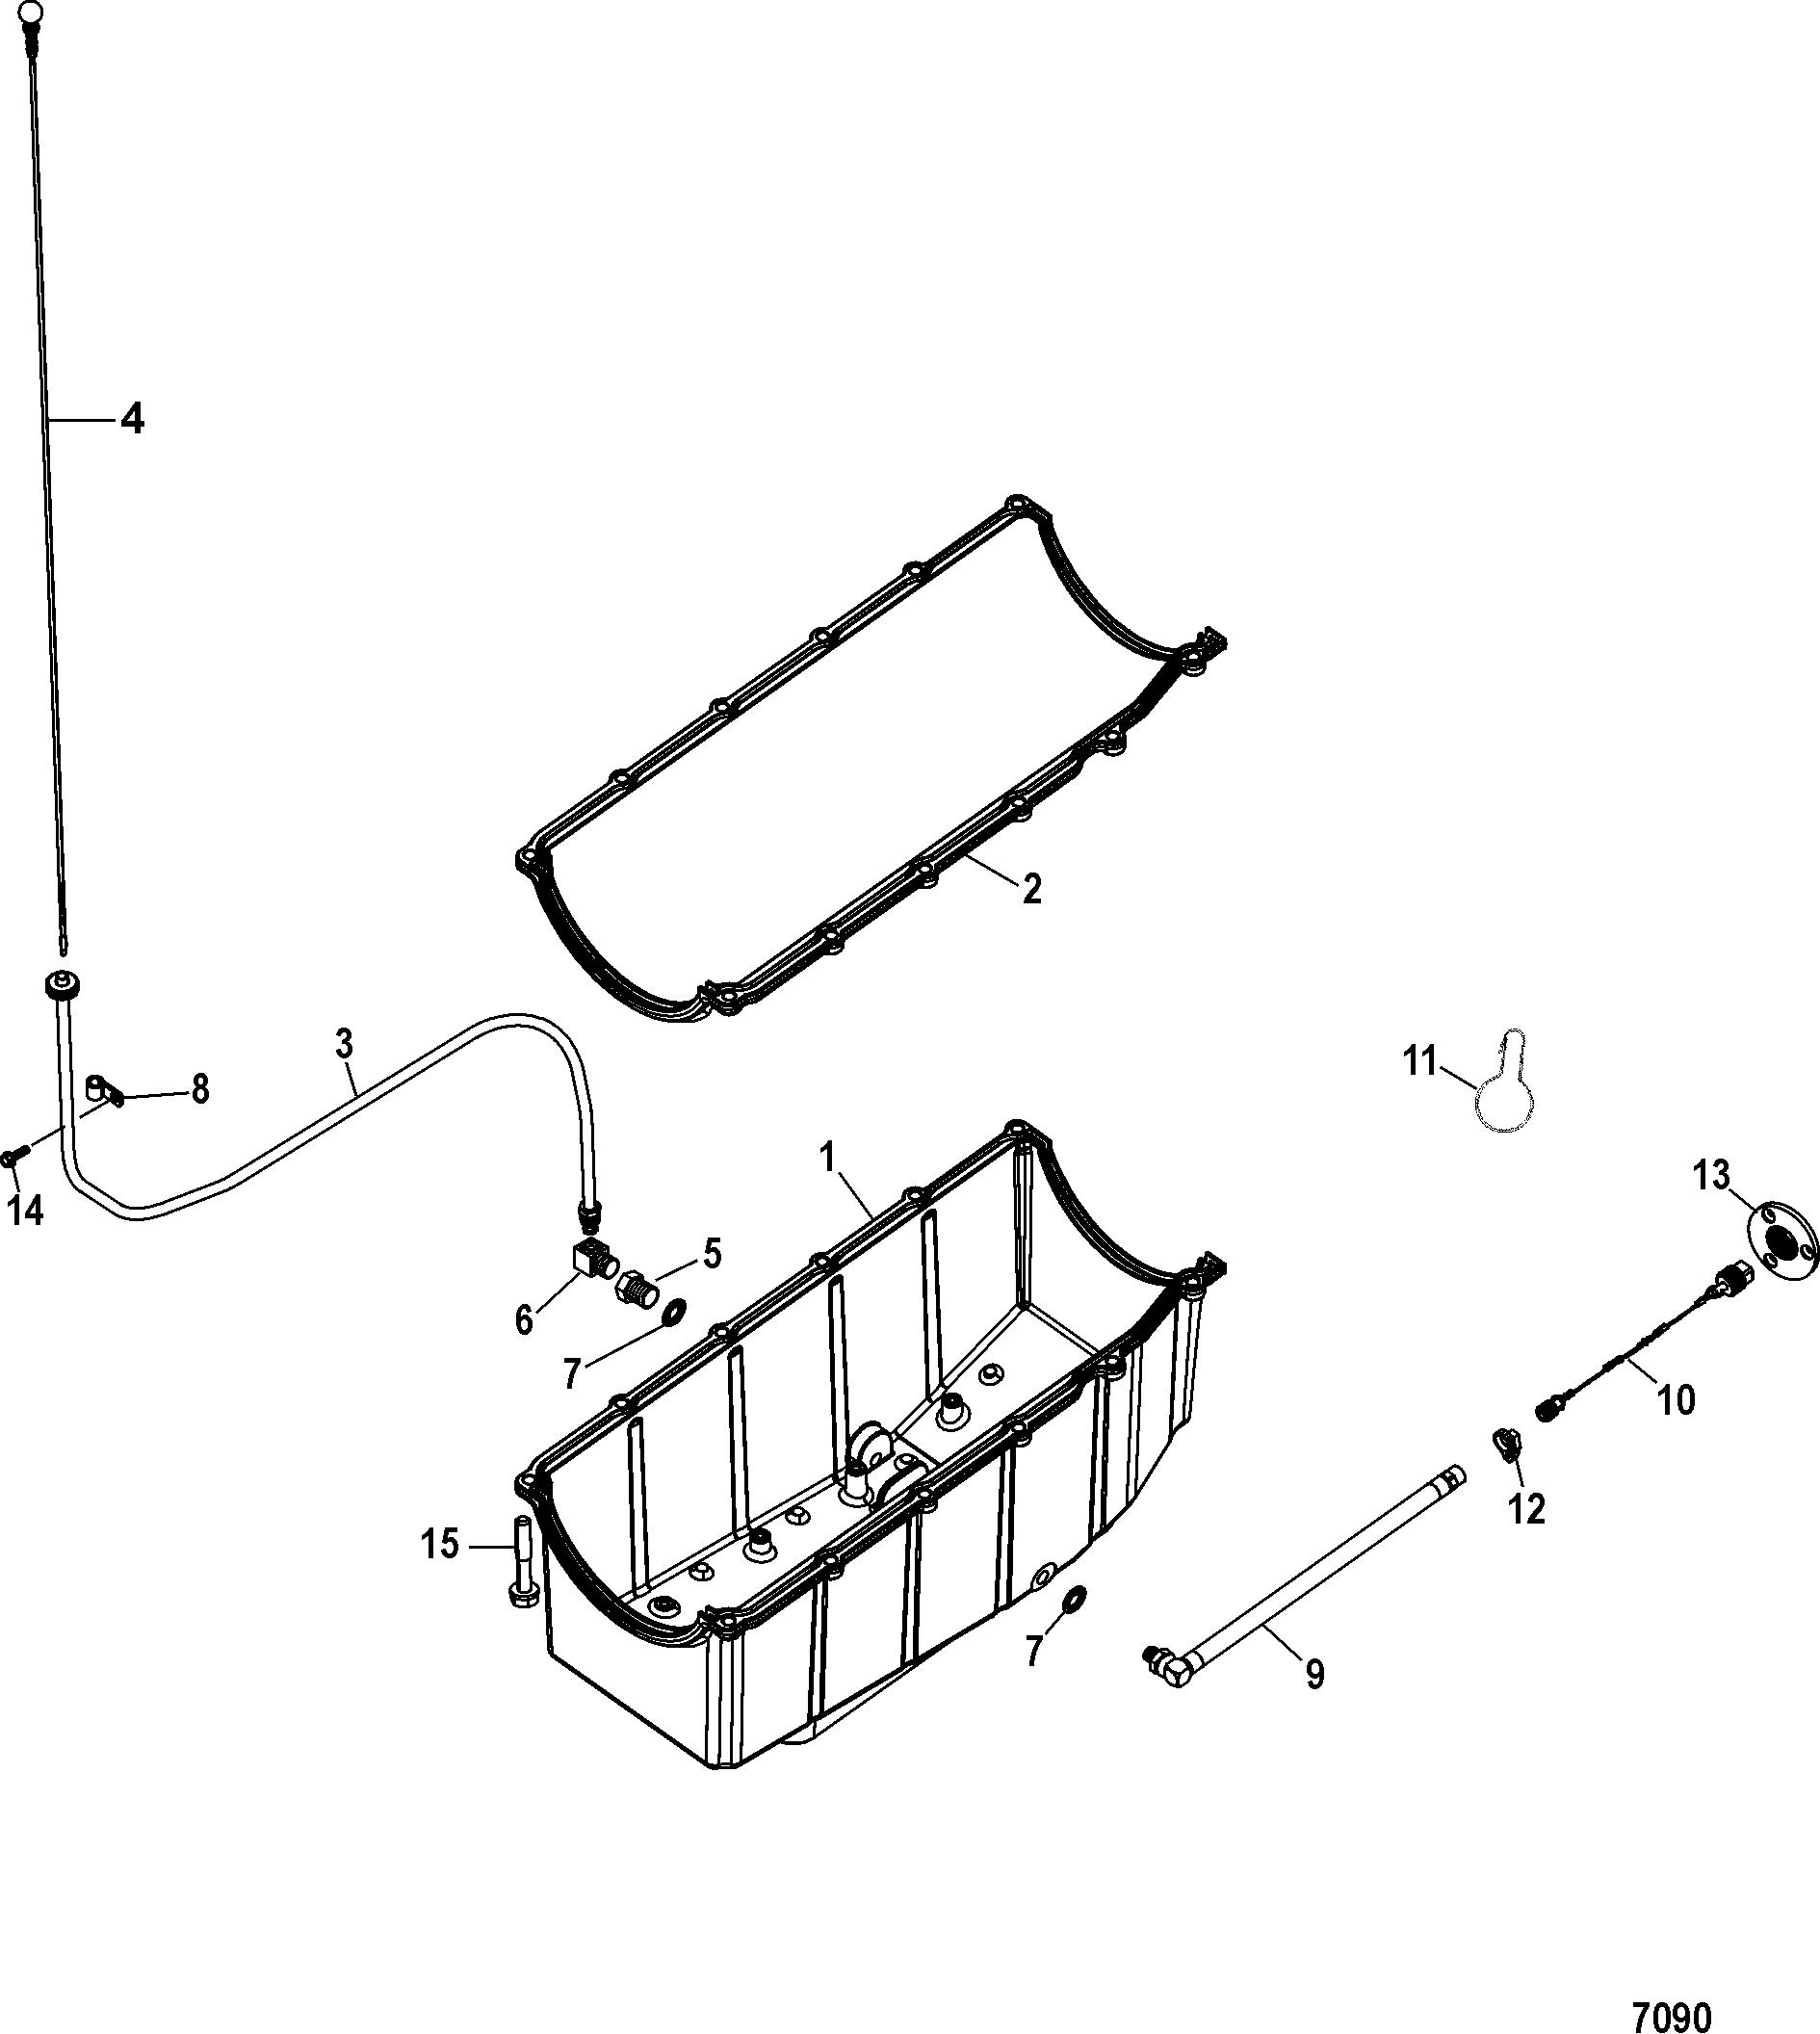 Каталог запчастей MERCRUISER остальные 496 MAG EC (H O